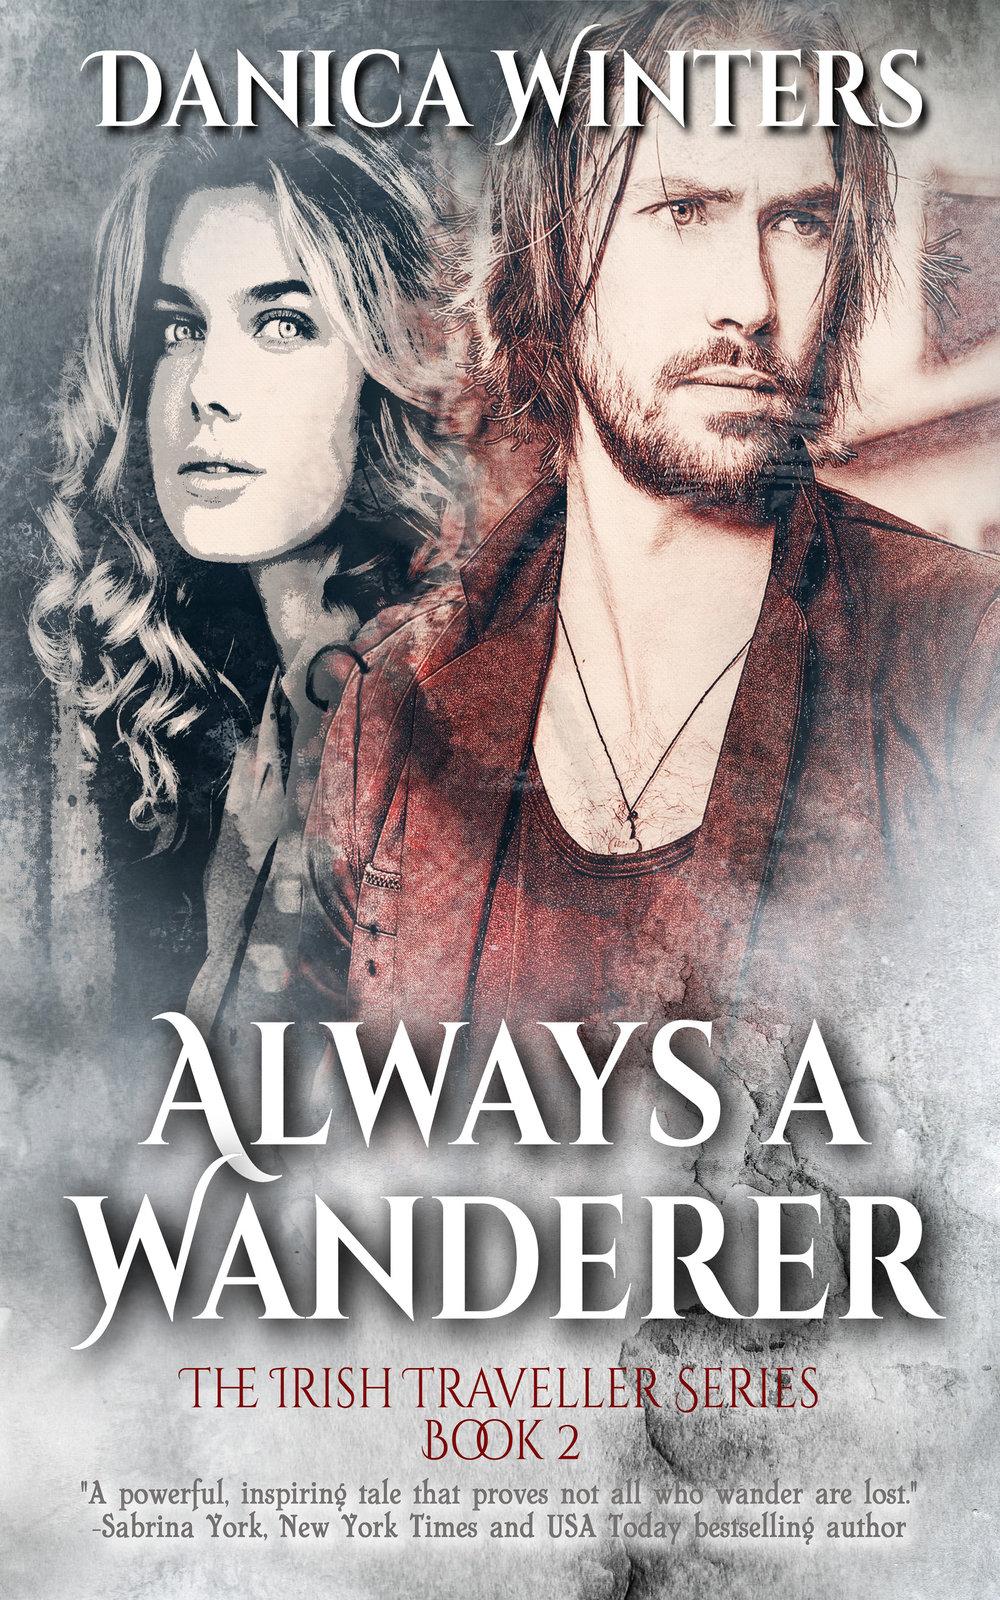 Always a Wanderer-300dpi-2560x1600.jpg